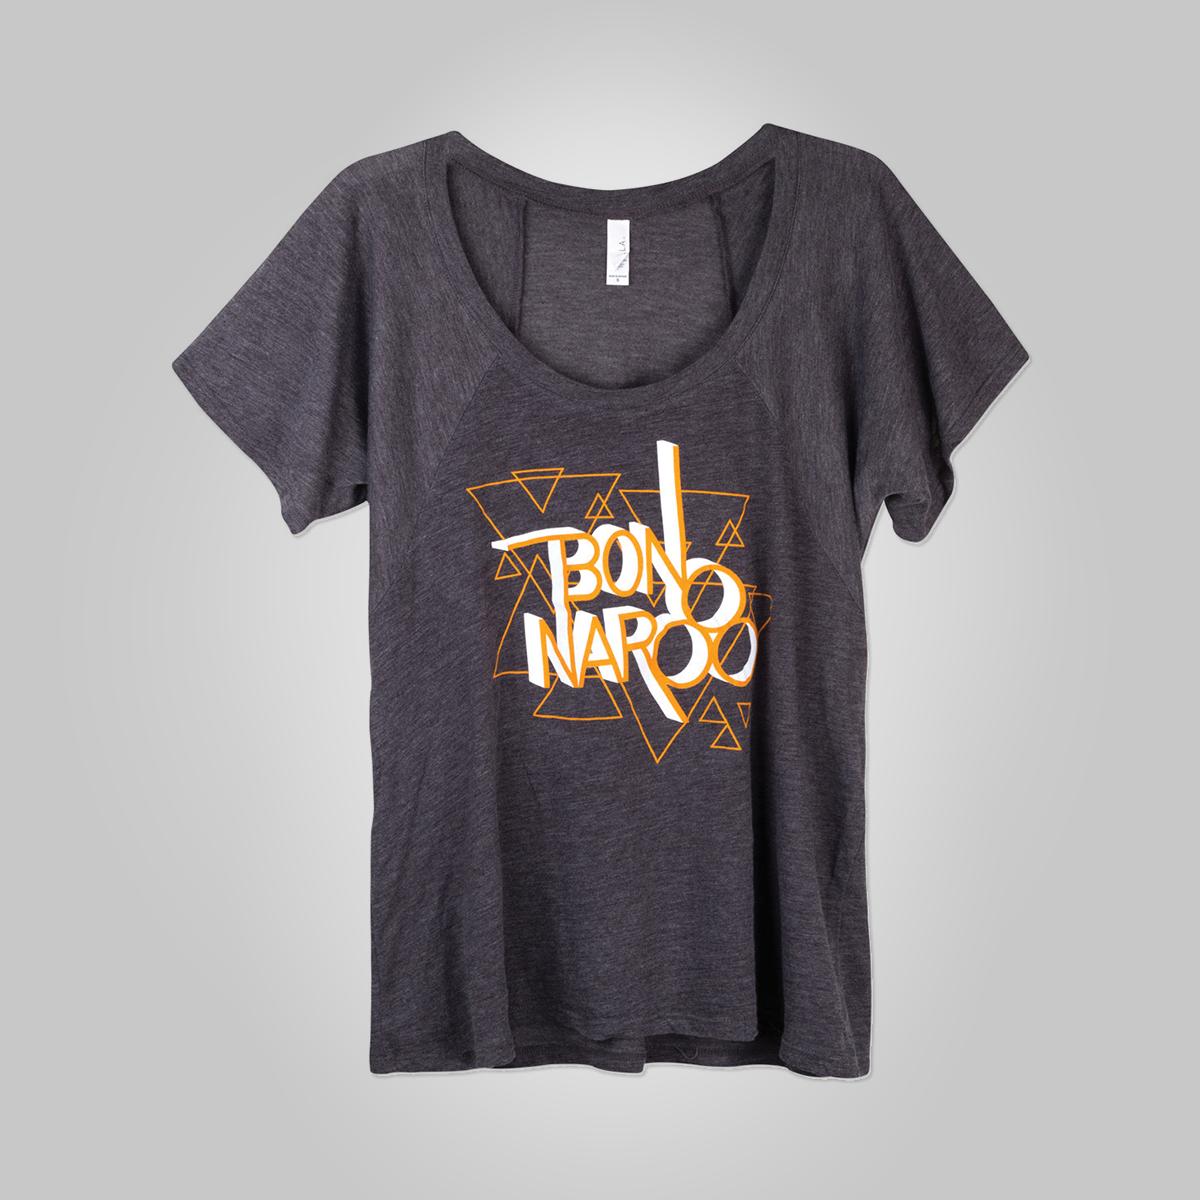 Bonnaroo T-Shirt Design